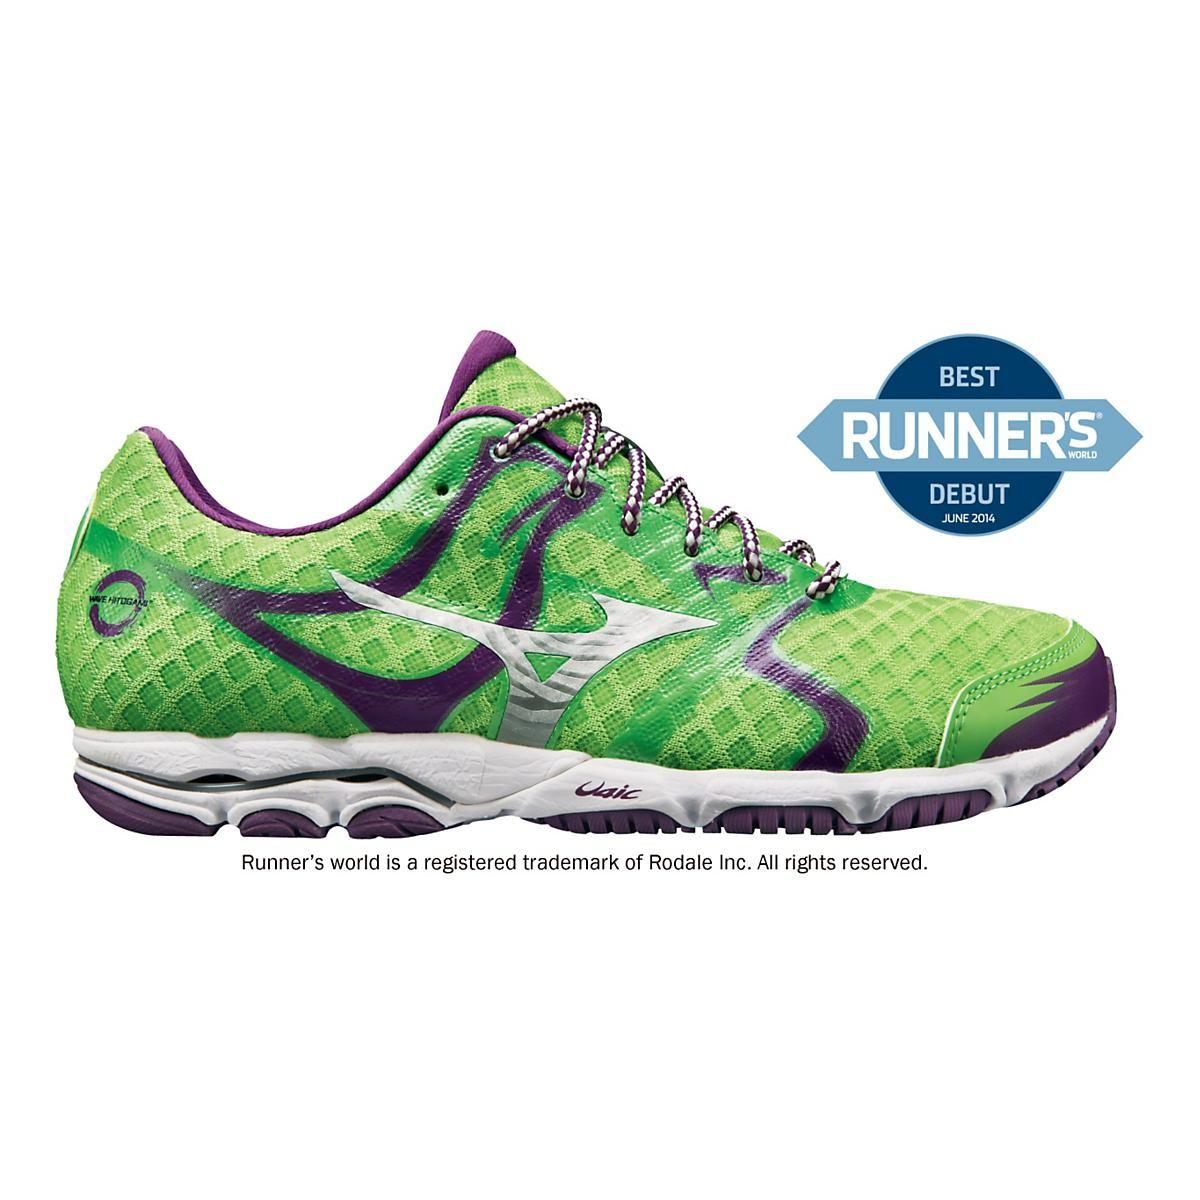 Mizuno running shoes, Mizuno shoes